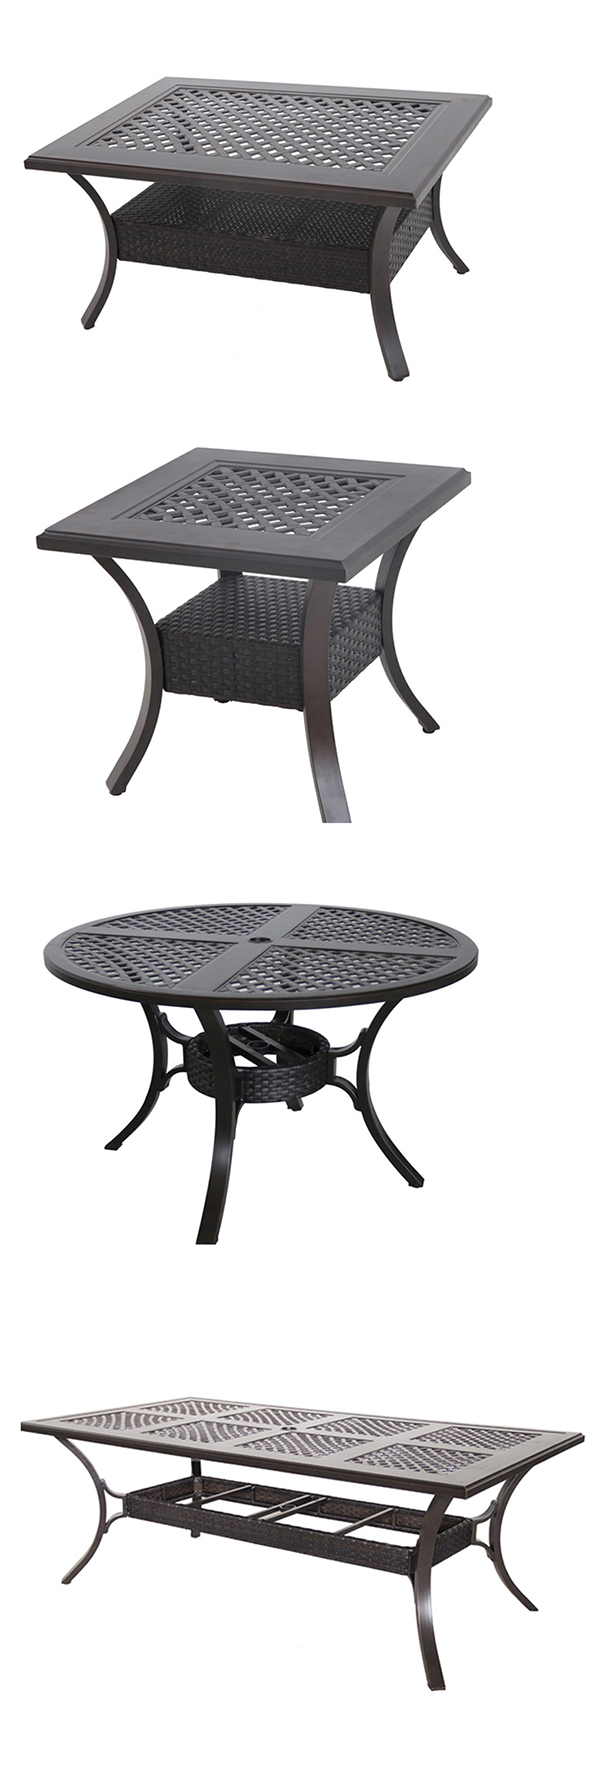 Portica by Sunvilla Collection Patio Table